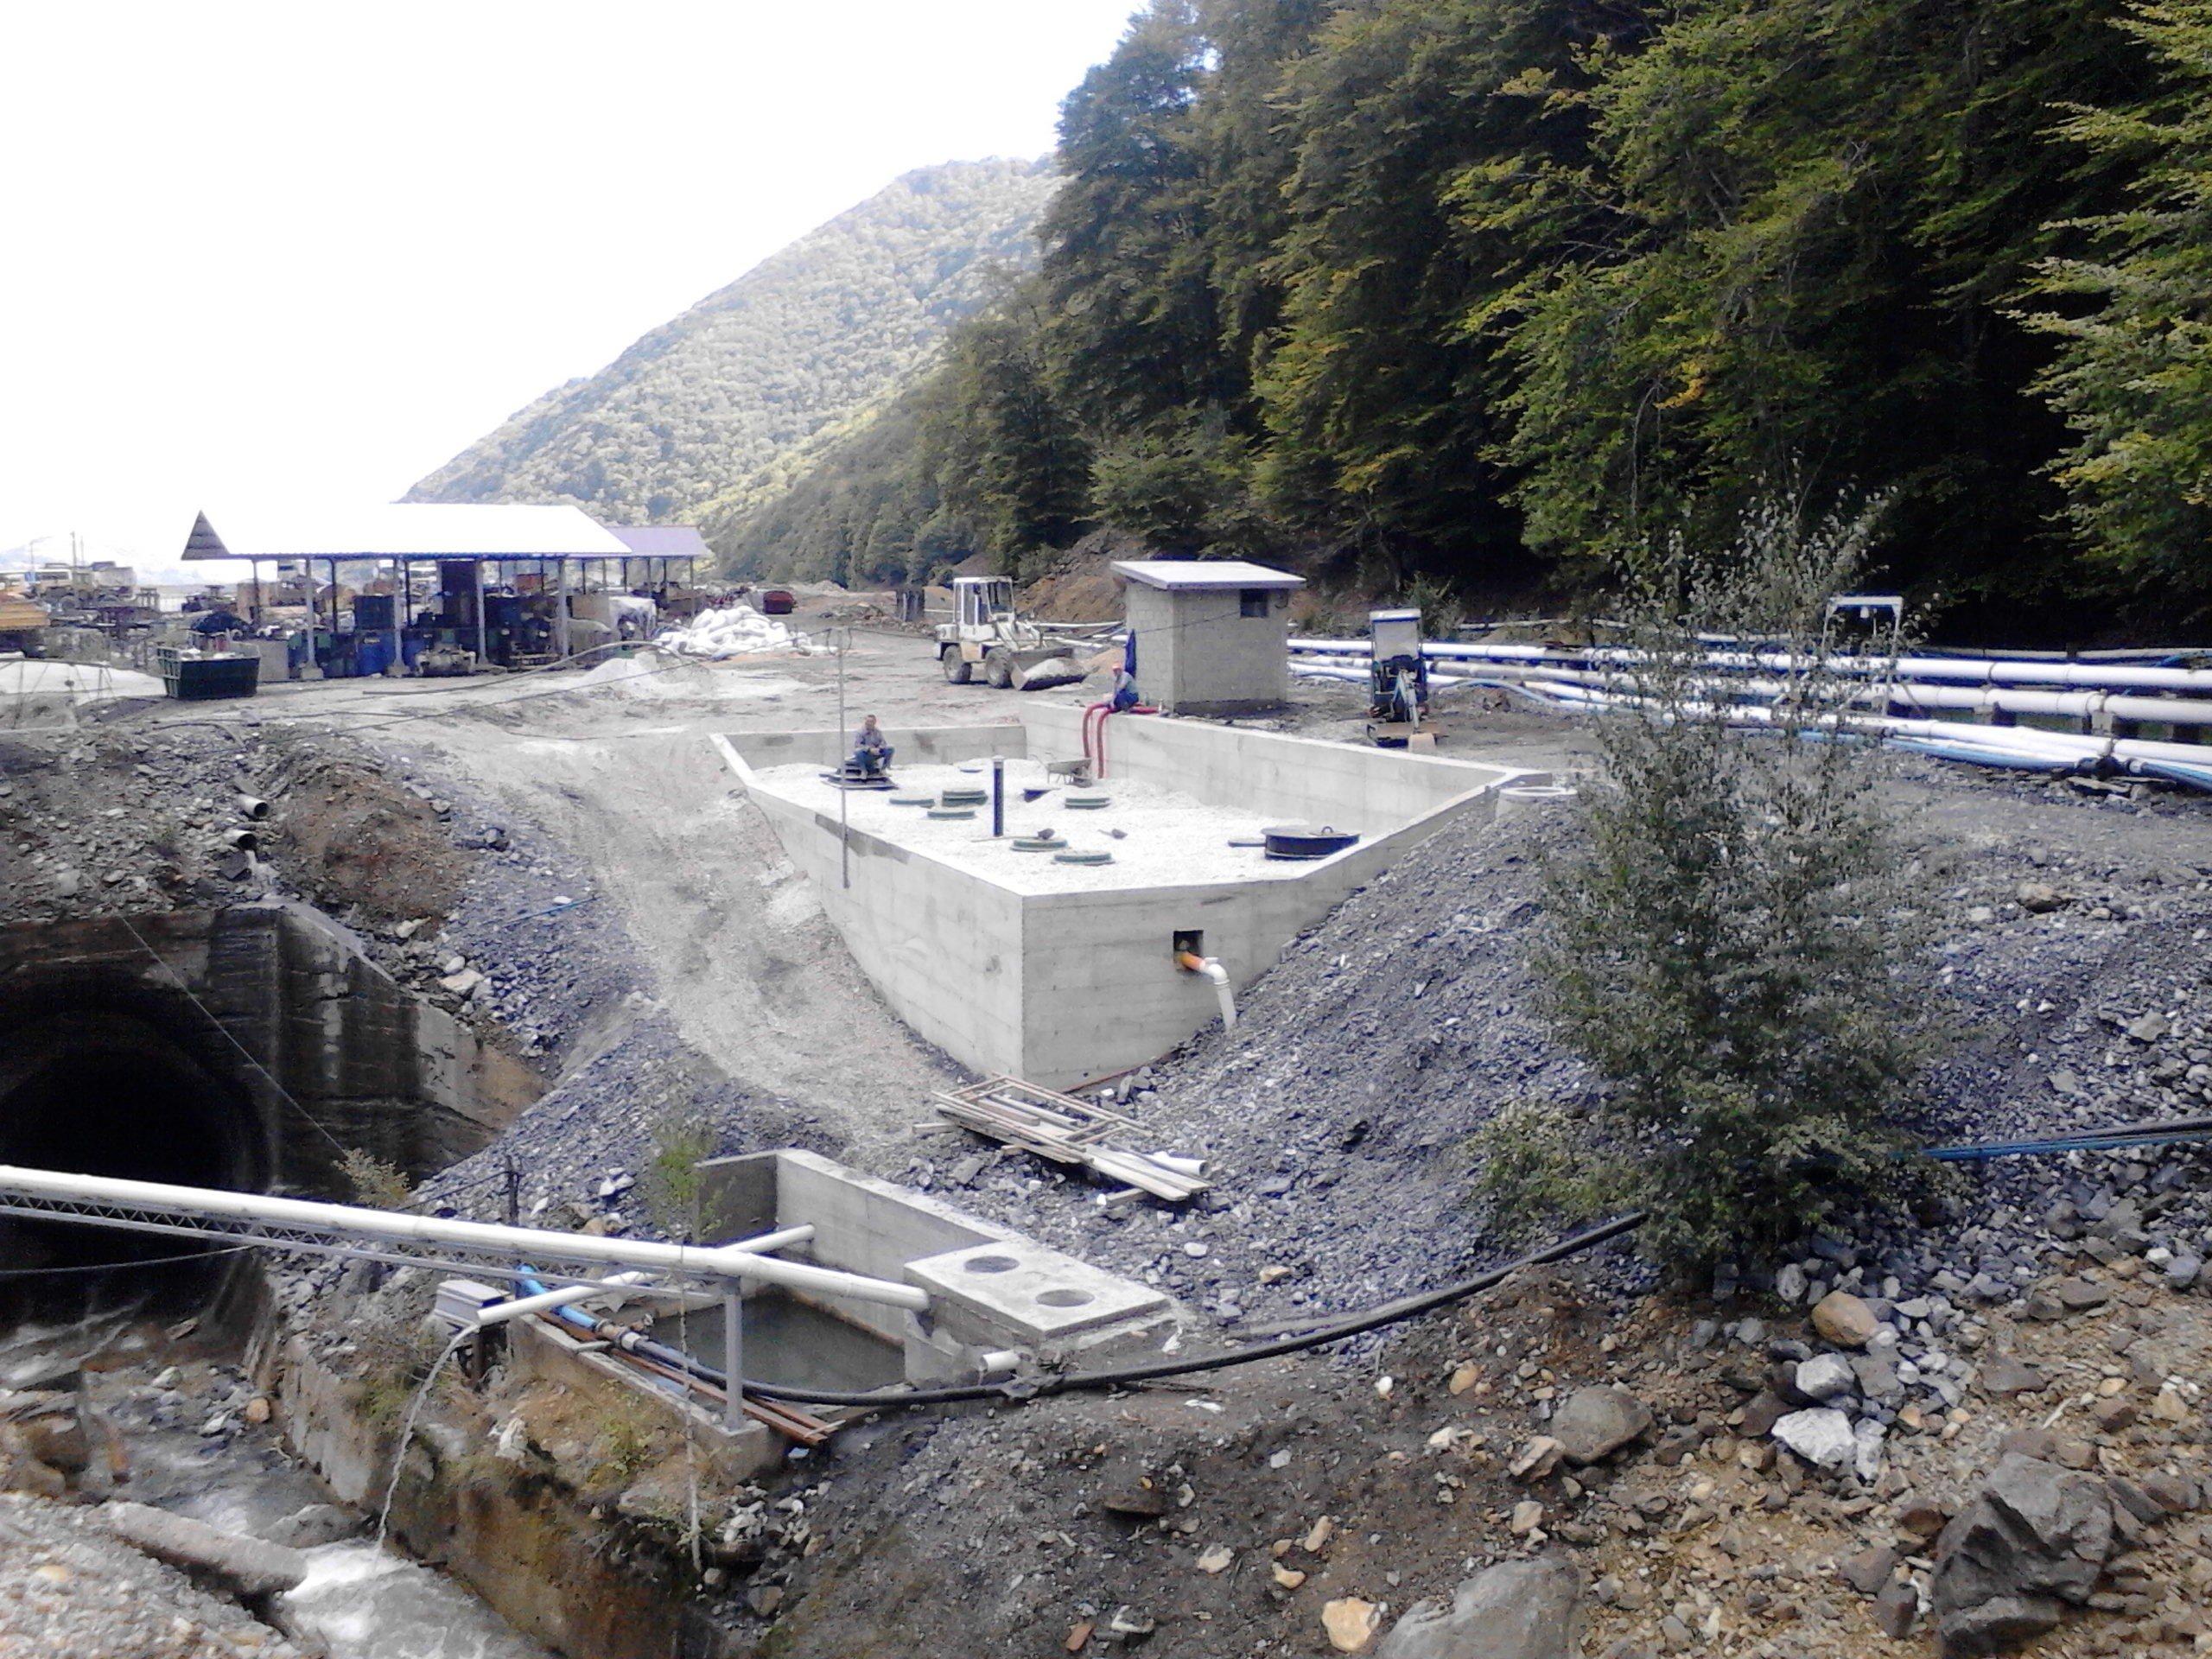 ROTO-RoClean-500PE-MBBR-Rudnik-Kamenica-Severna-Makedonija-referenca-1